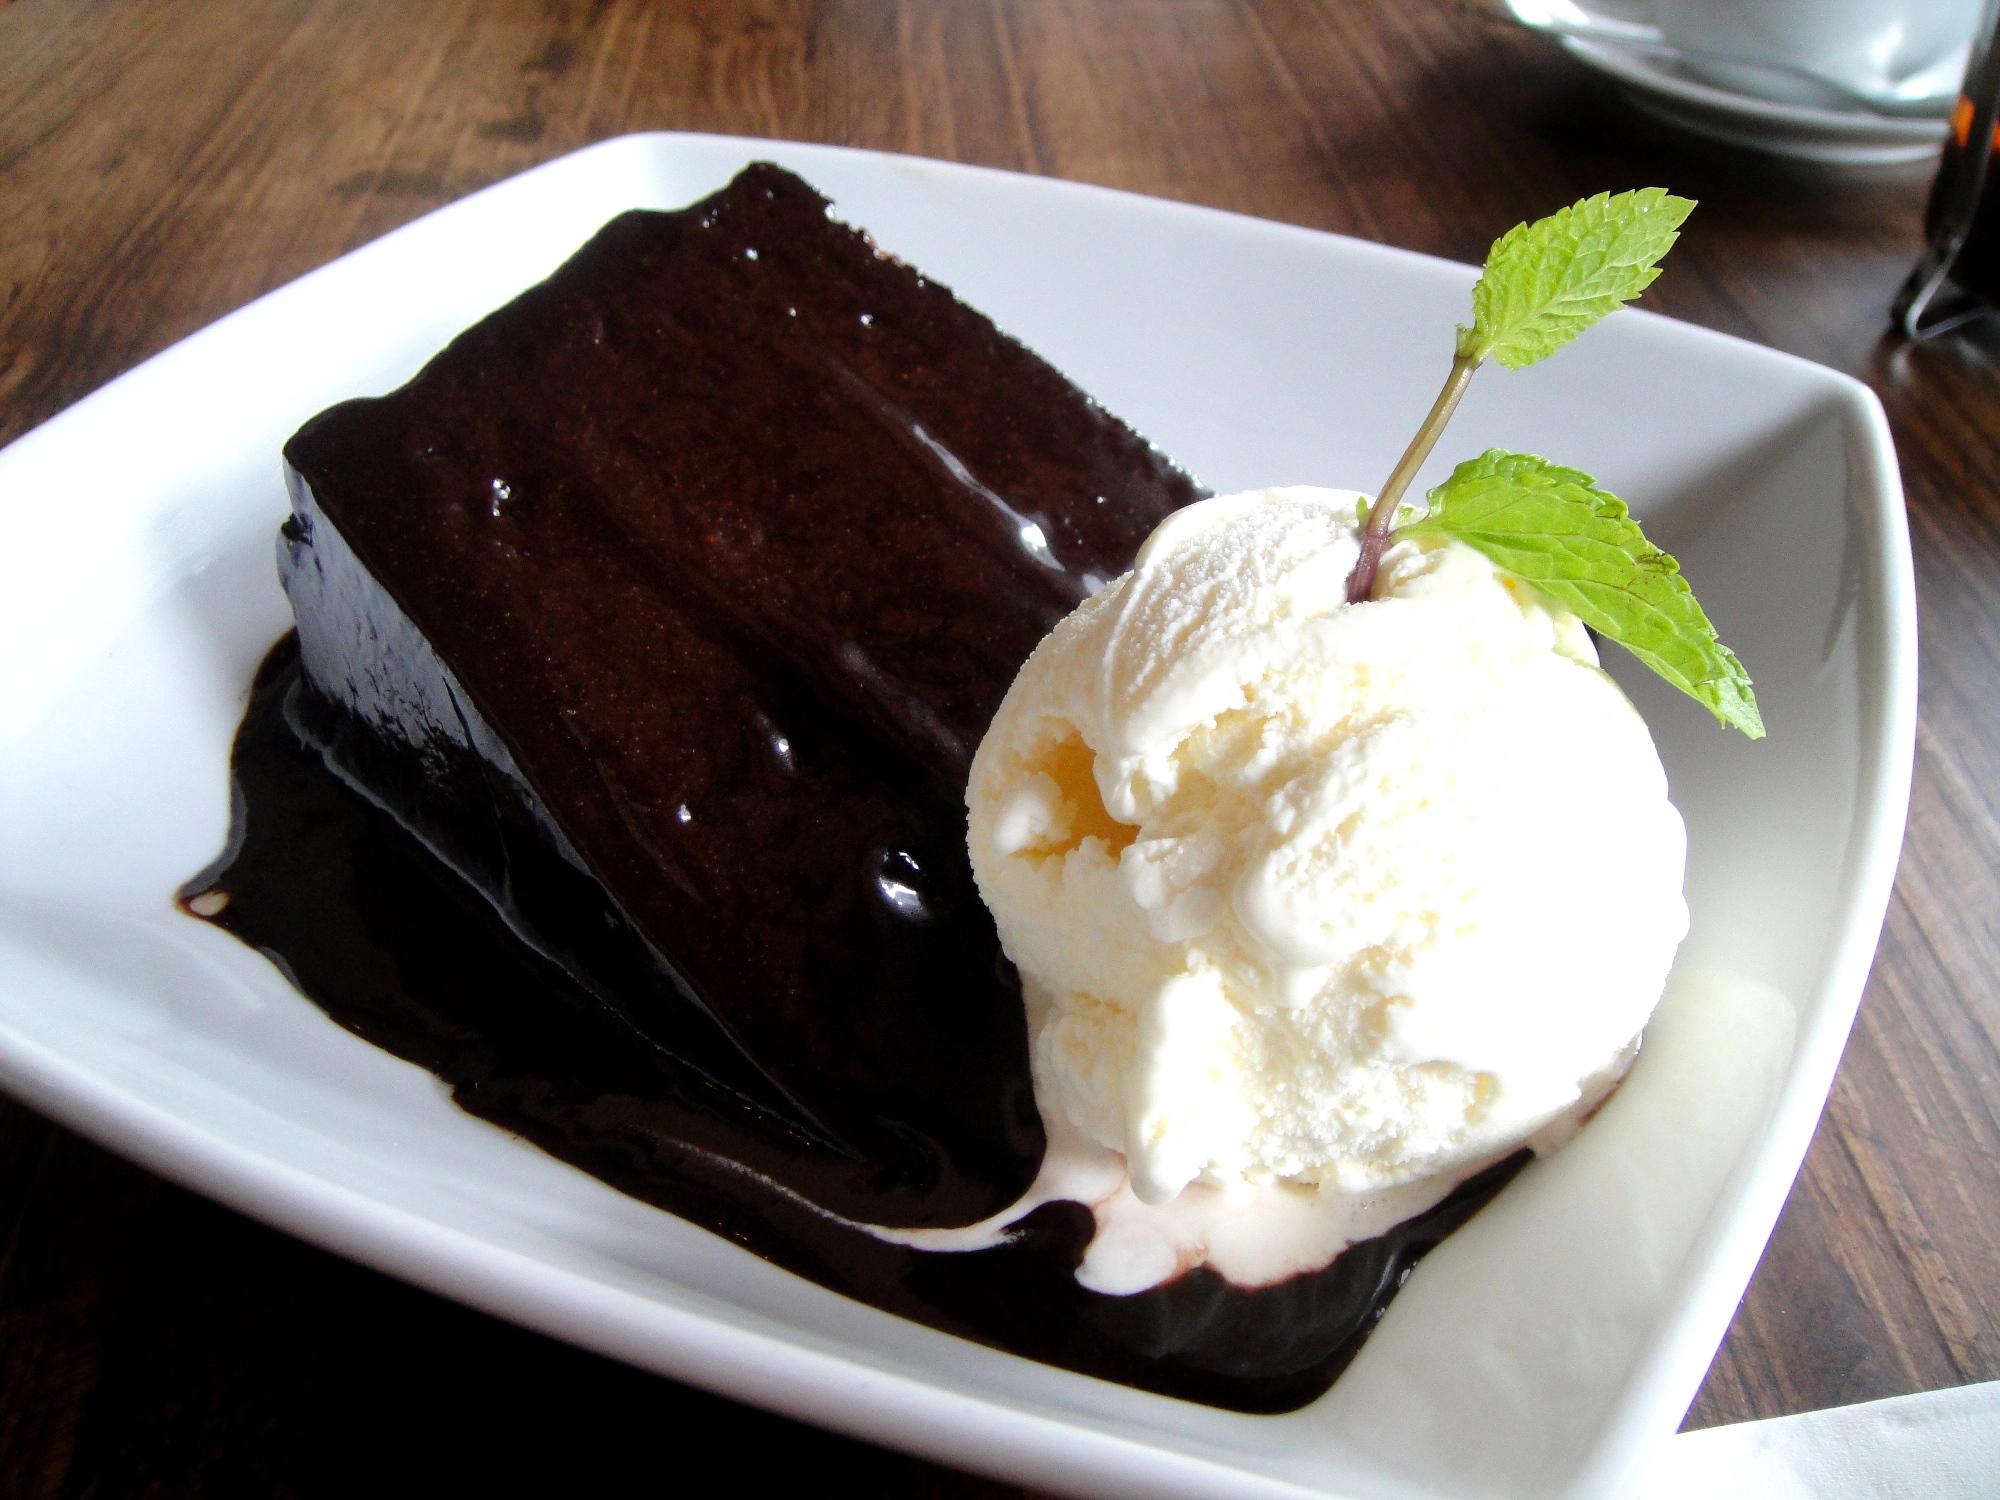 cake and coffe yhok 2.jpg